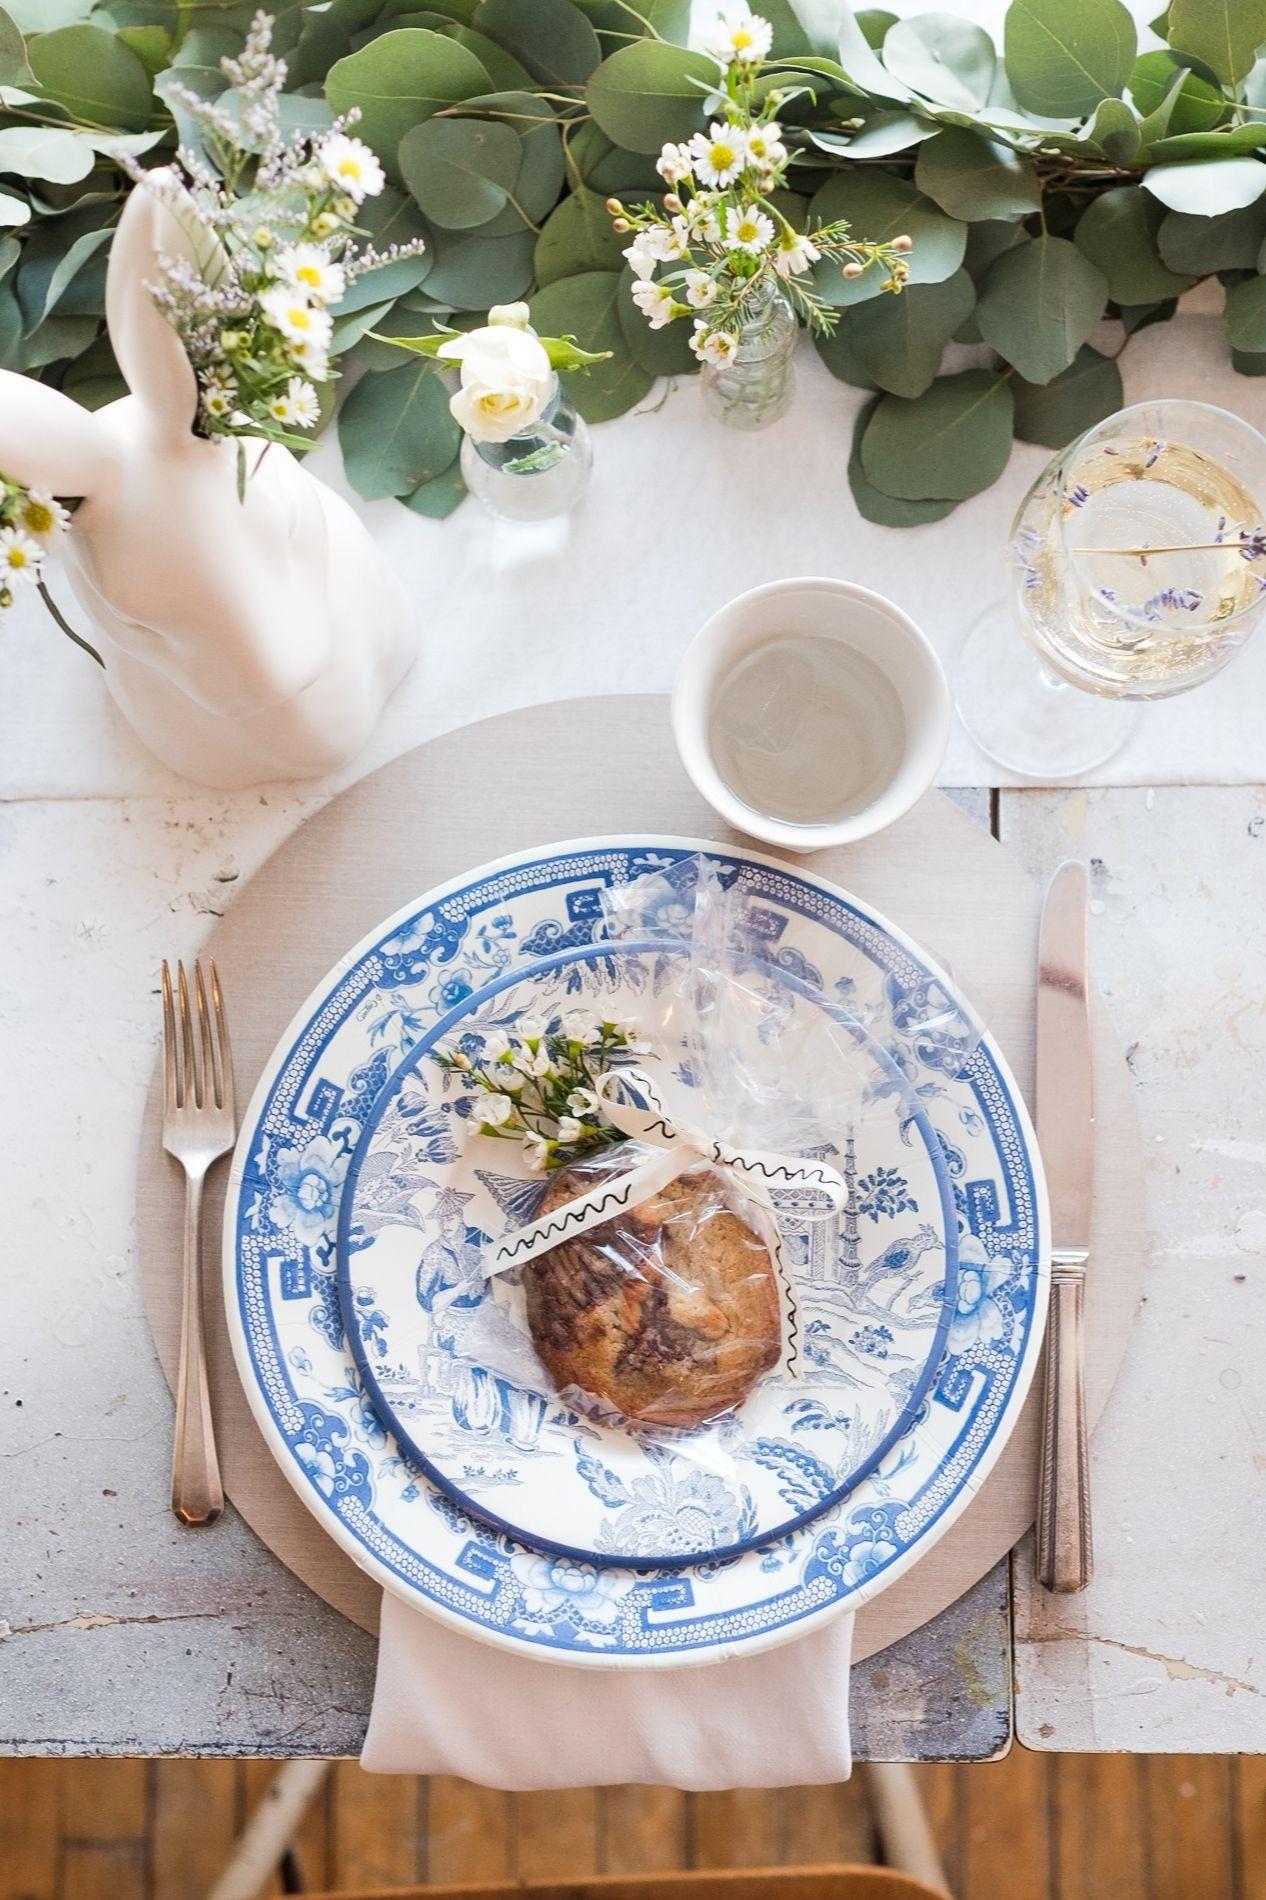 Caspari Blue & White Plates and Maman Chocolate Chip Cookie